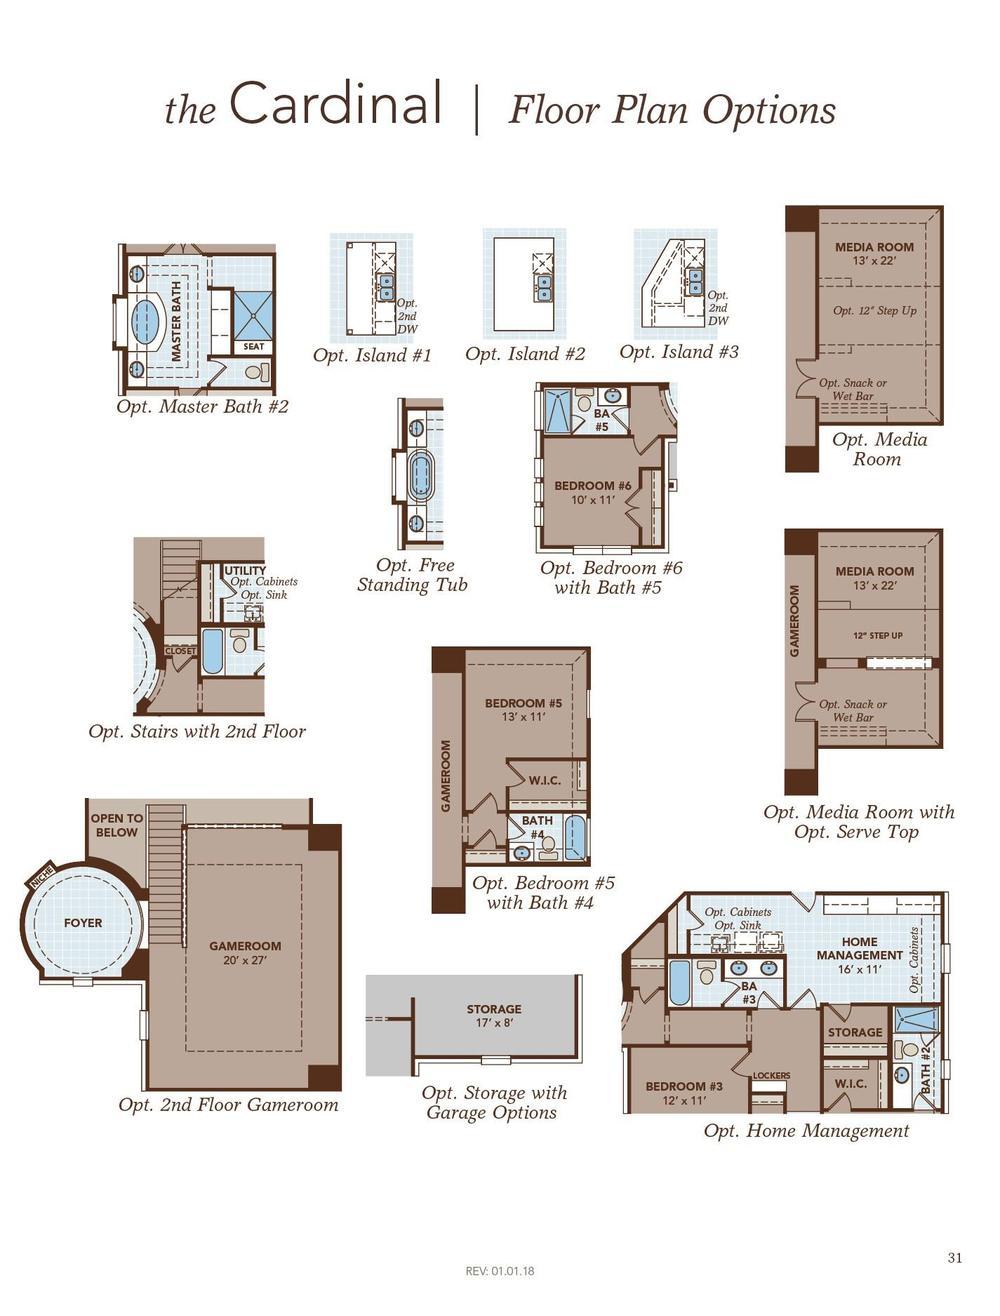 Cardinal Floor Plan Options